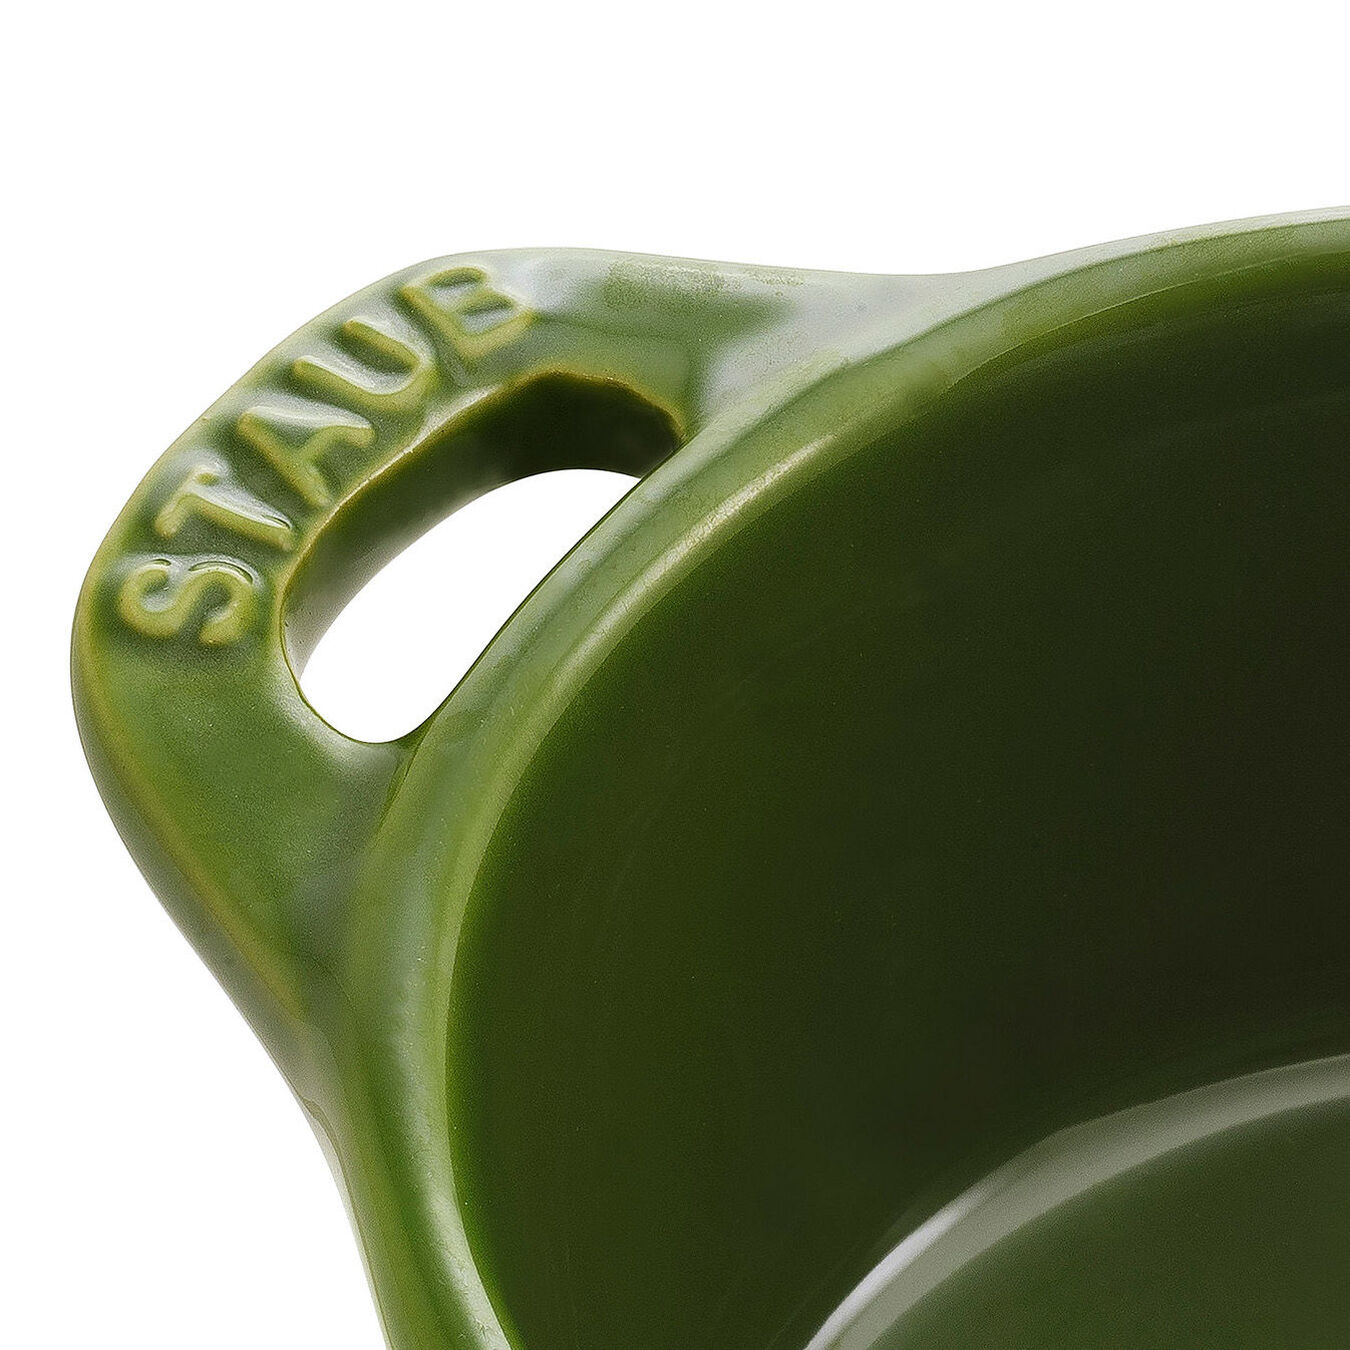 Mini Cocotte 10 cm, rund, Basilikum-Grün, Keramik,,large 4